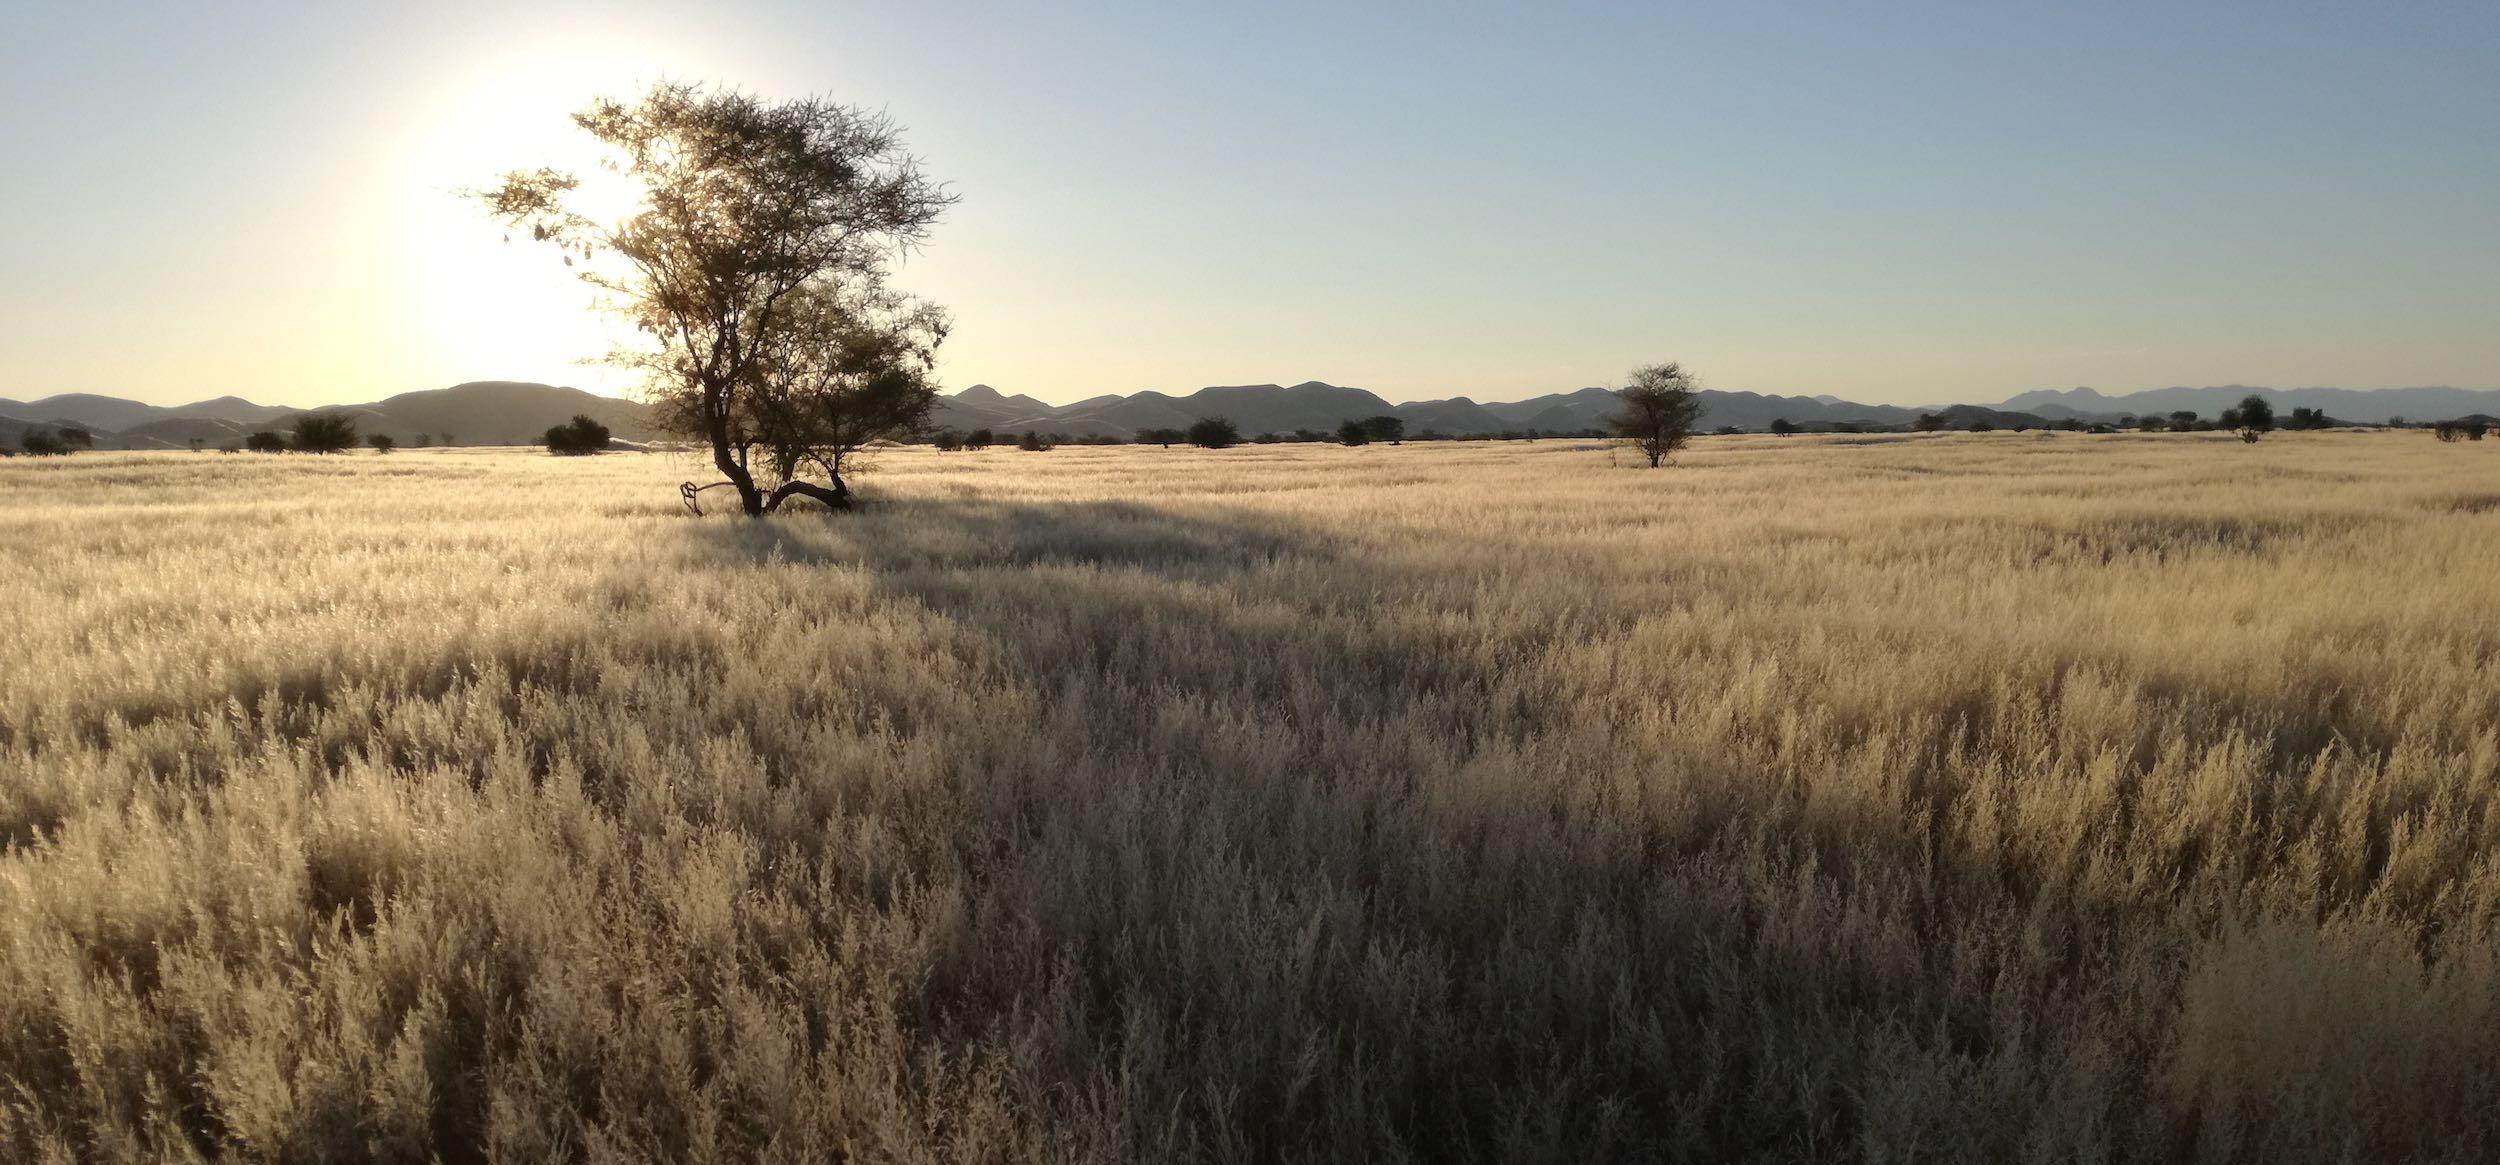 Namibian grasslands.